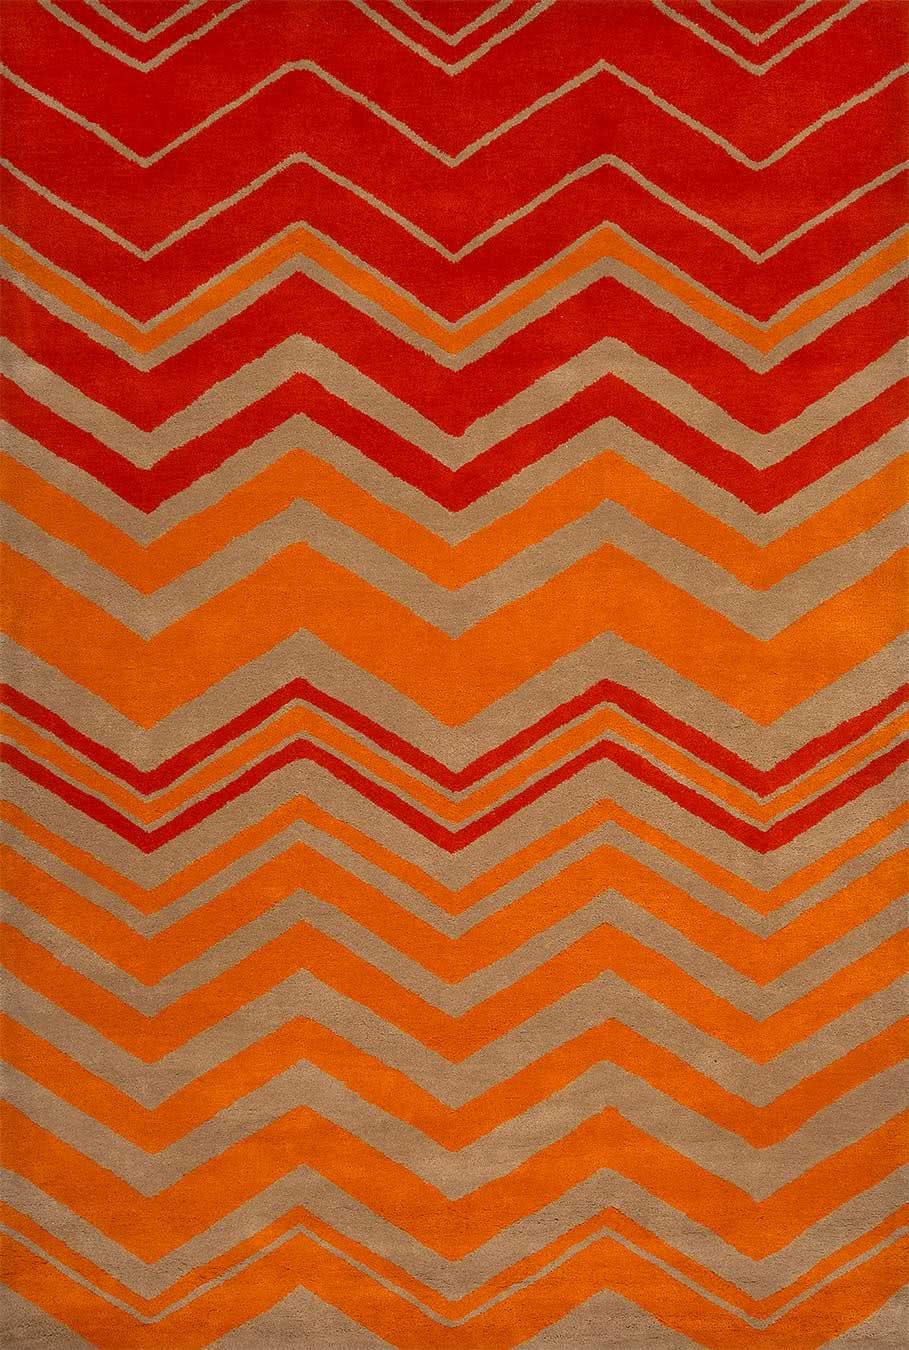 Harlem rug in Fanta colourway overhead image